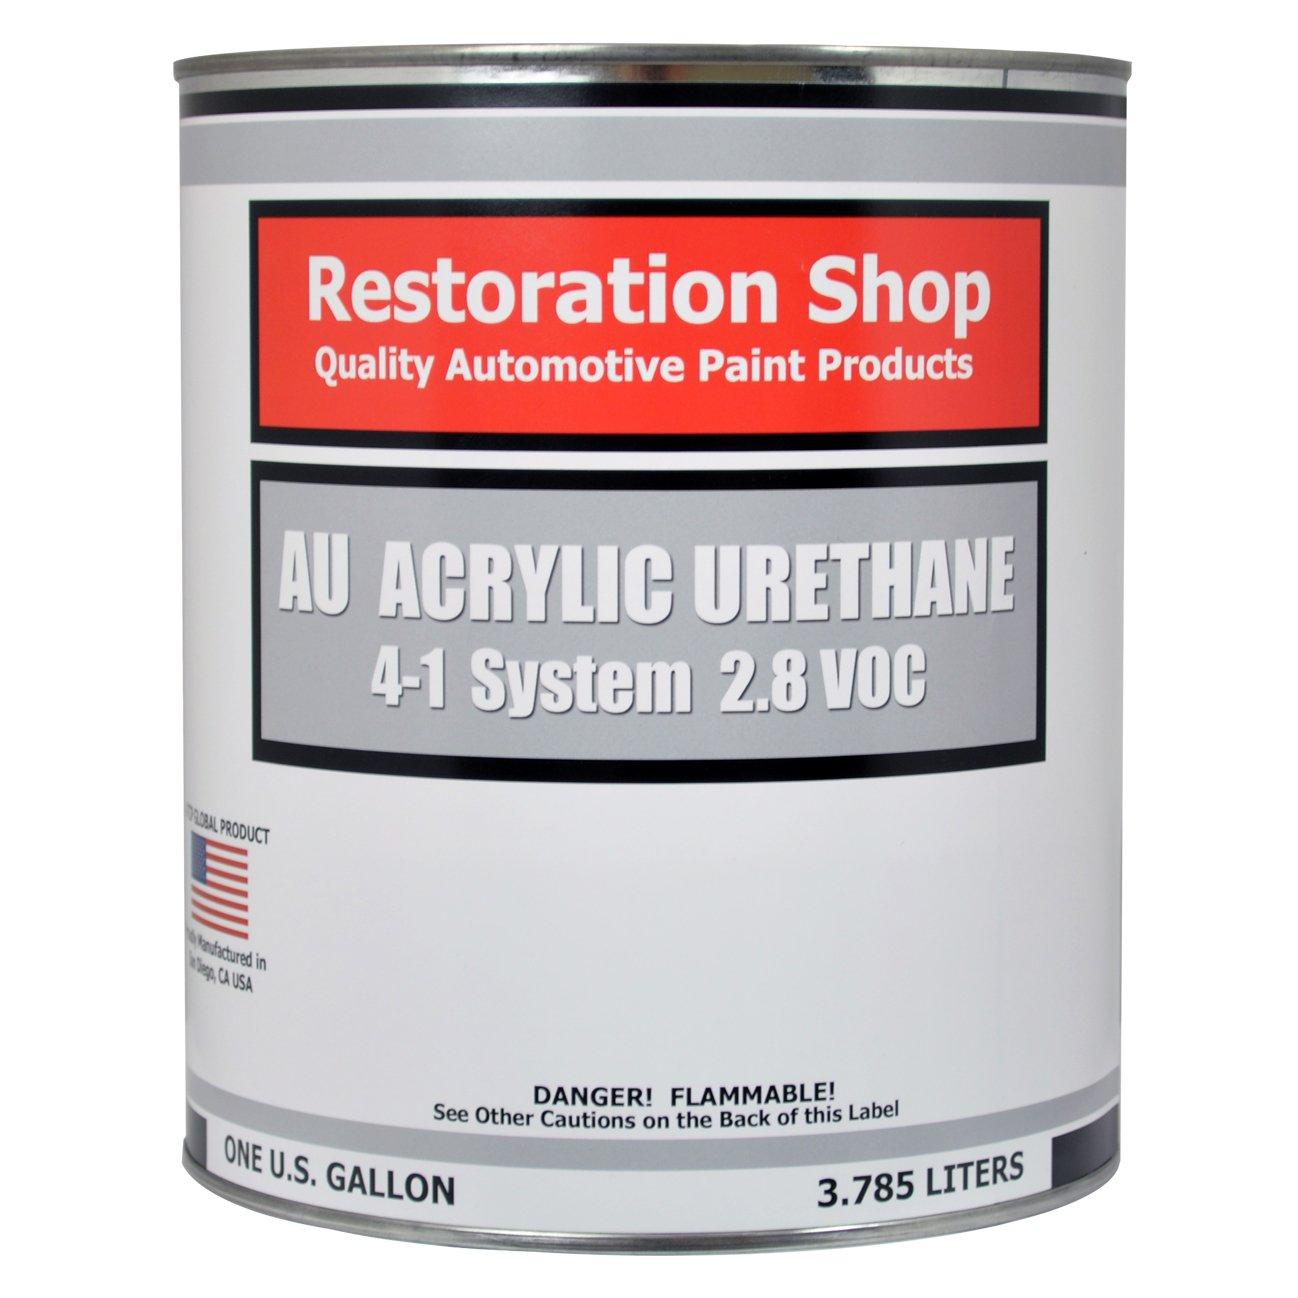 Restoration Shop - Complete Gallon Kit - Dark Midnight Blue Pearl Acrylic Urethane Single Stage Car Auto Paint by Restoration Shop (Image #2)